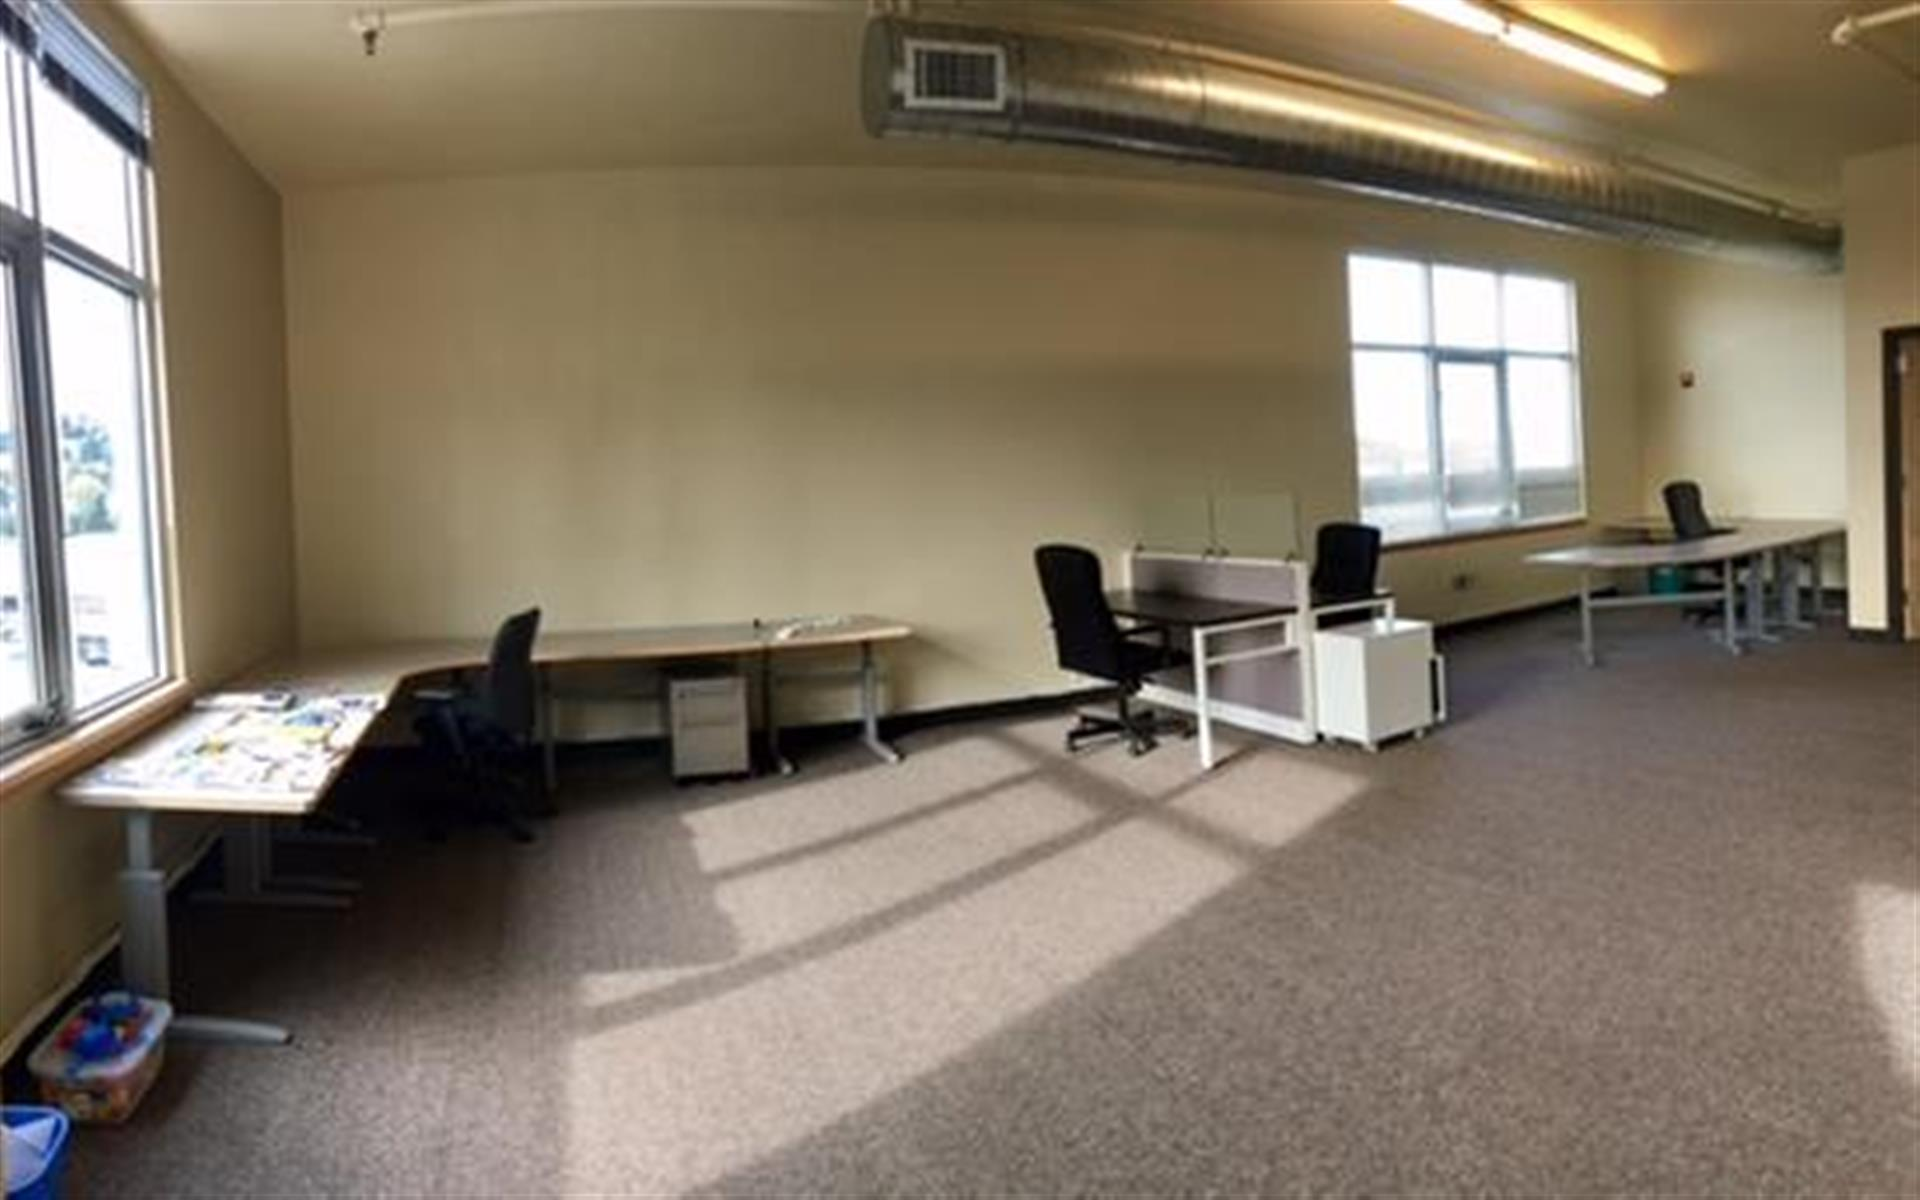 Kitterman - Dedicated Desk in Shared Space